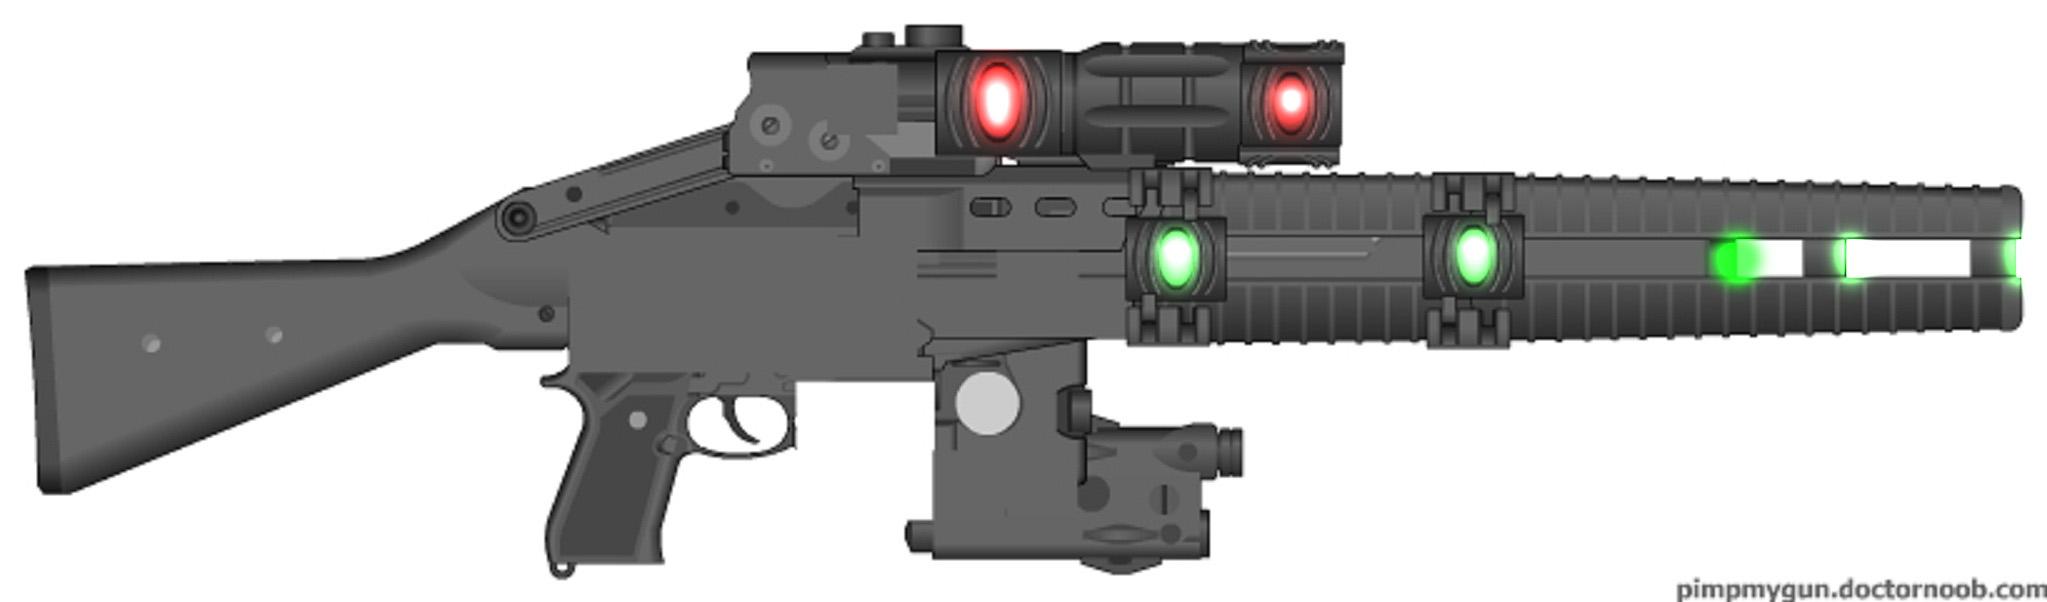 X400M Plasma Rifle by Marksman104